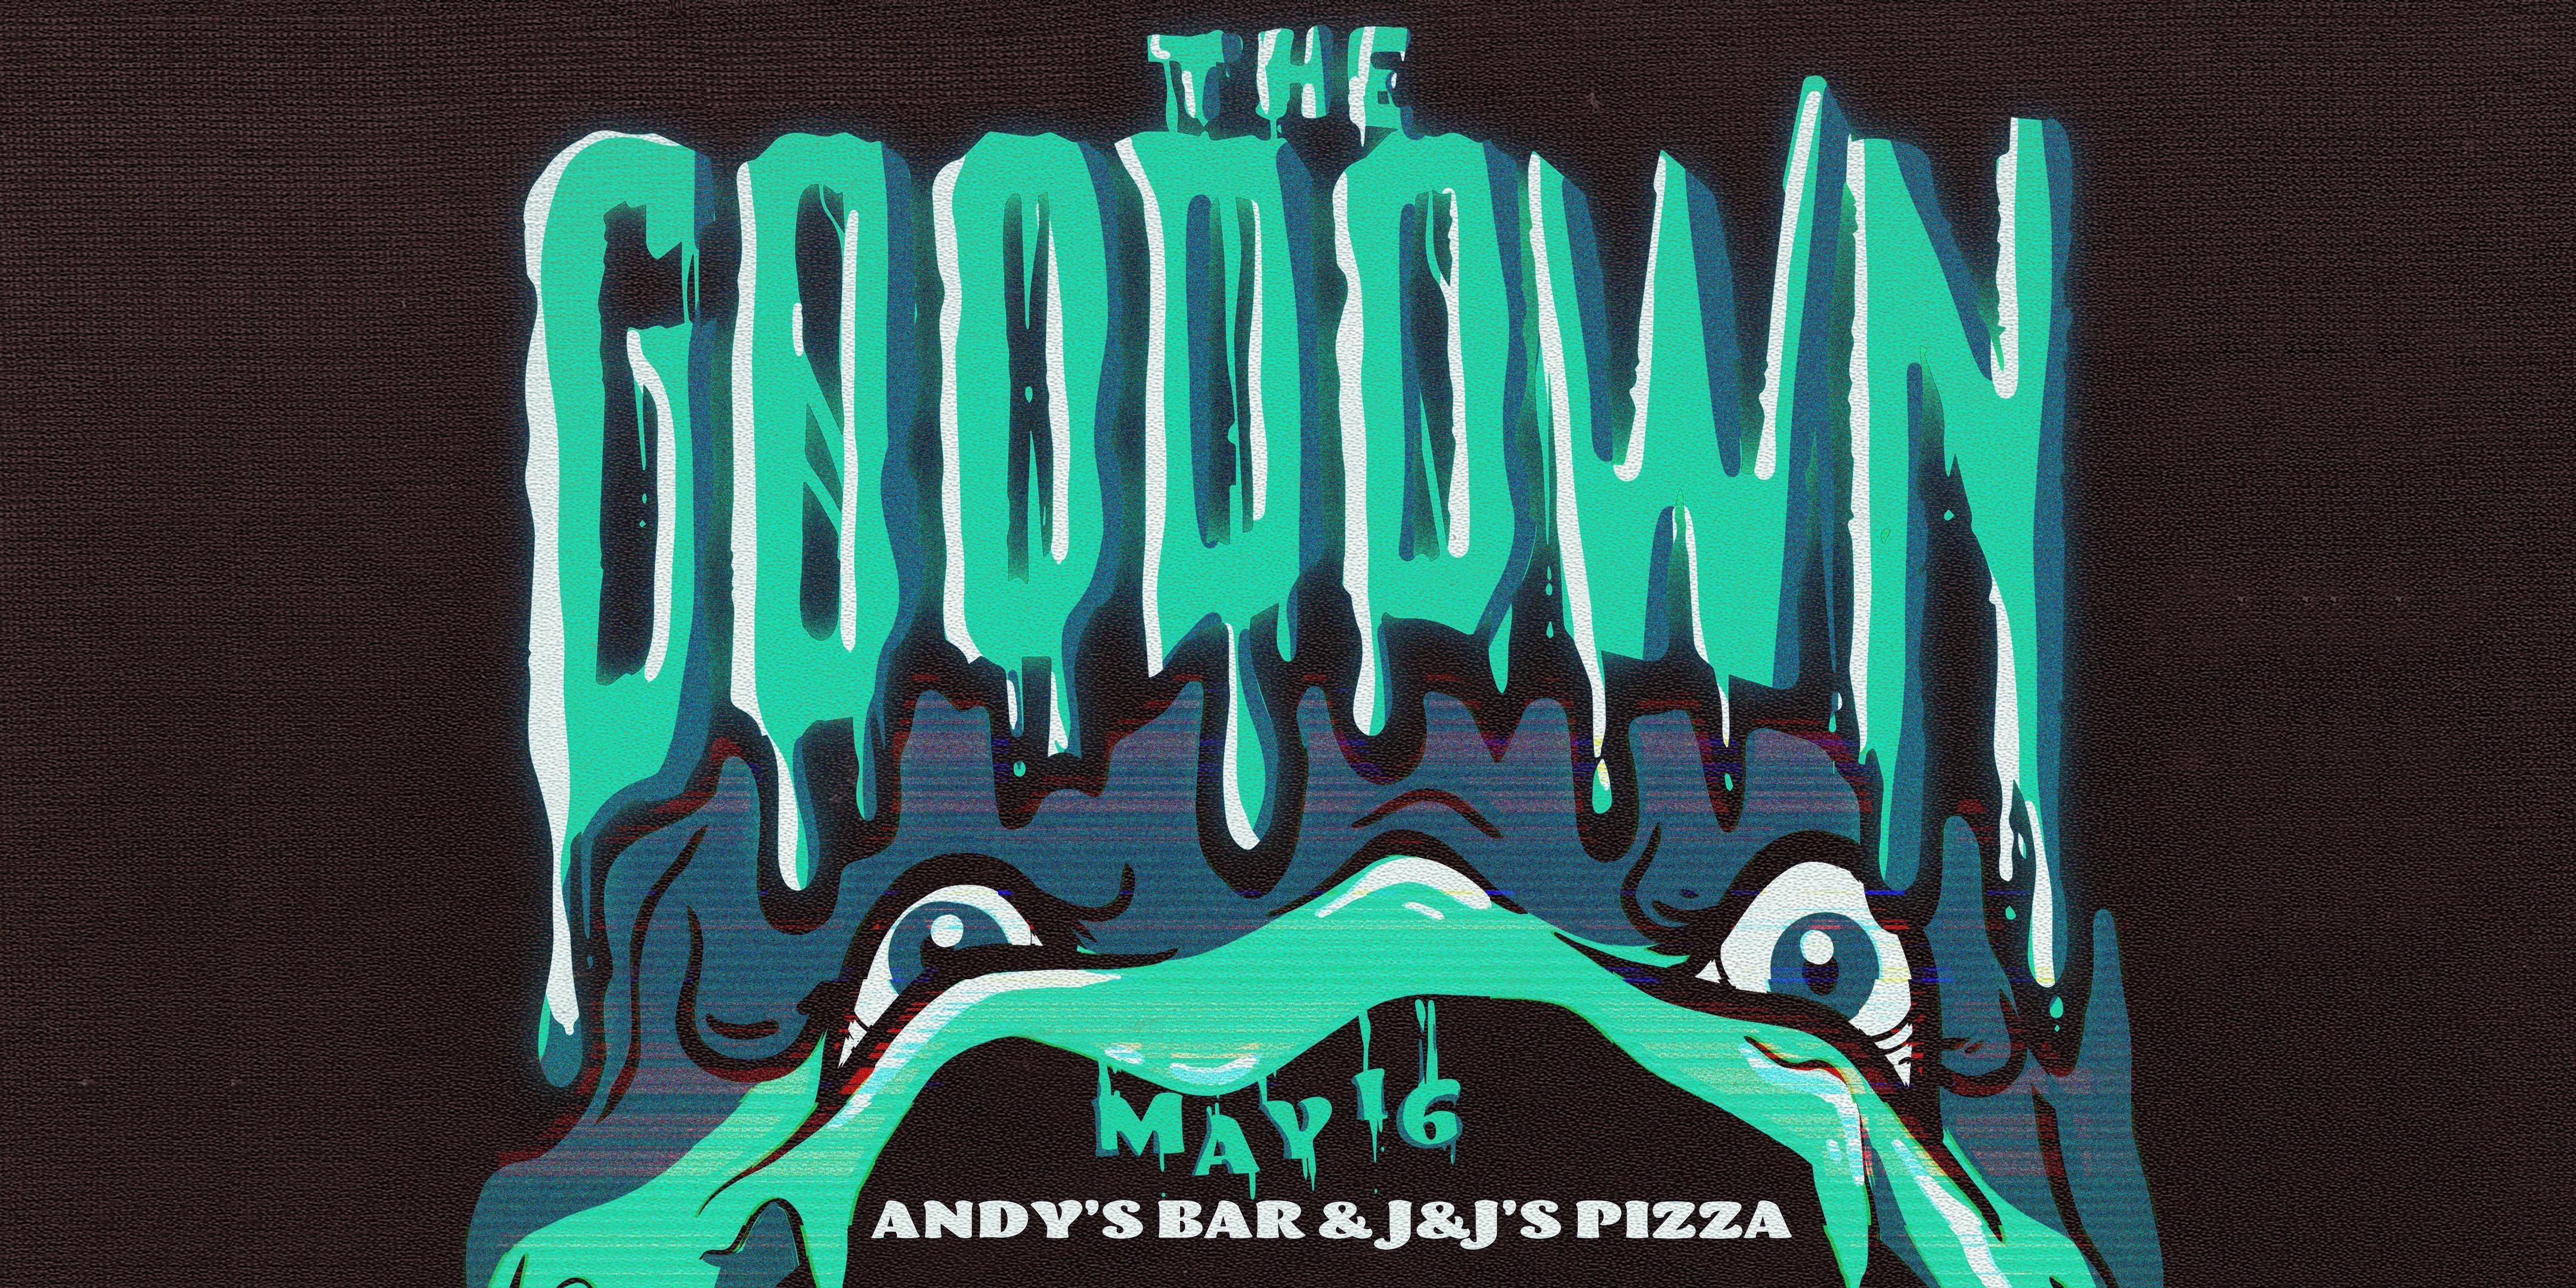 The Goo Down at Andys Bar & J&J's Pizza